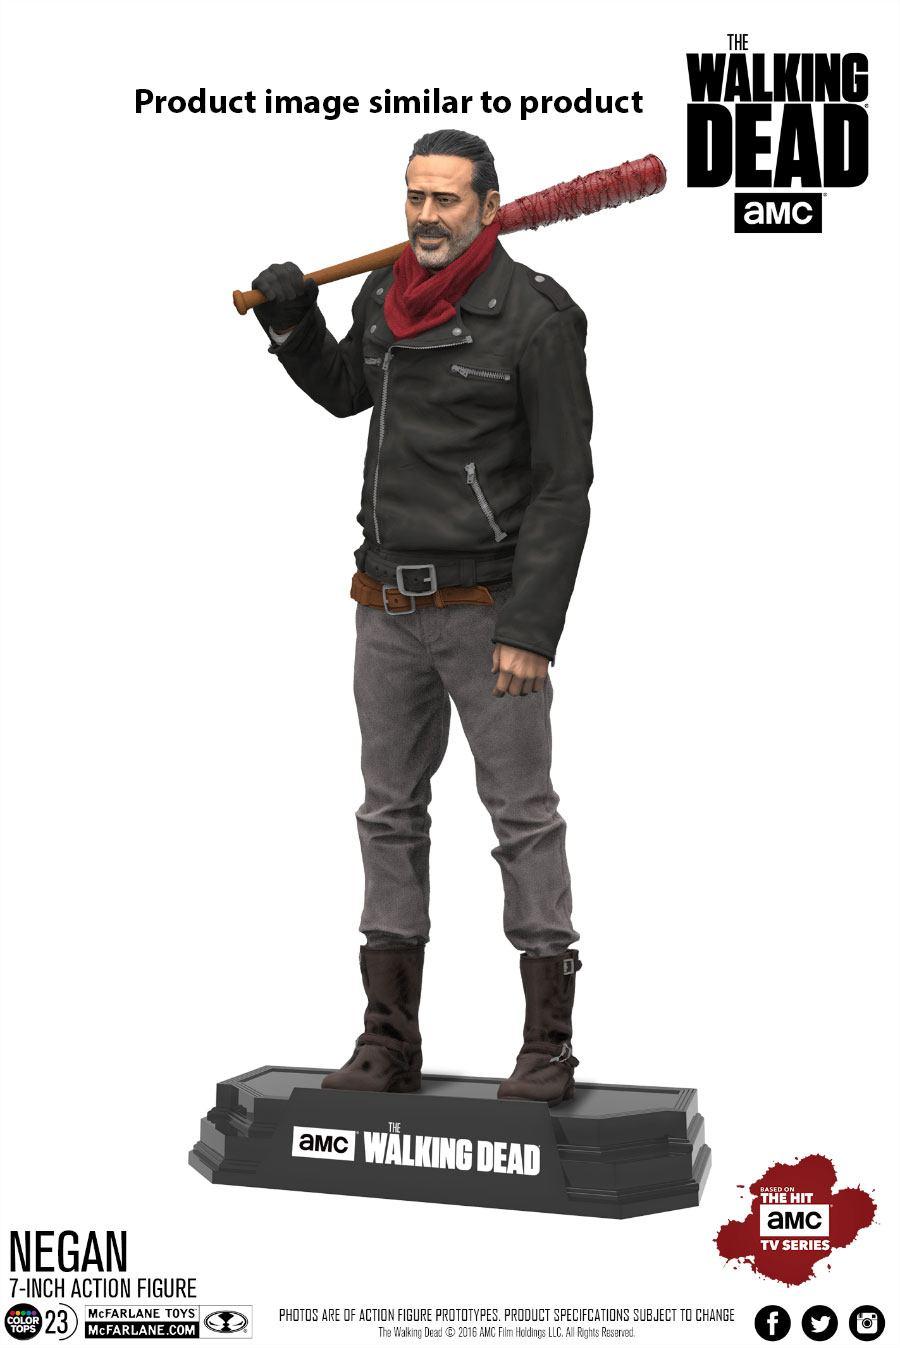 The Walking Dead TV Version Action Figure Negan Exclusive Bloody Edition 18 cm